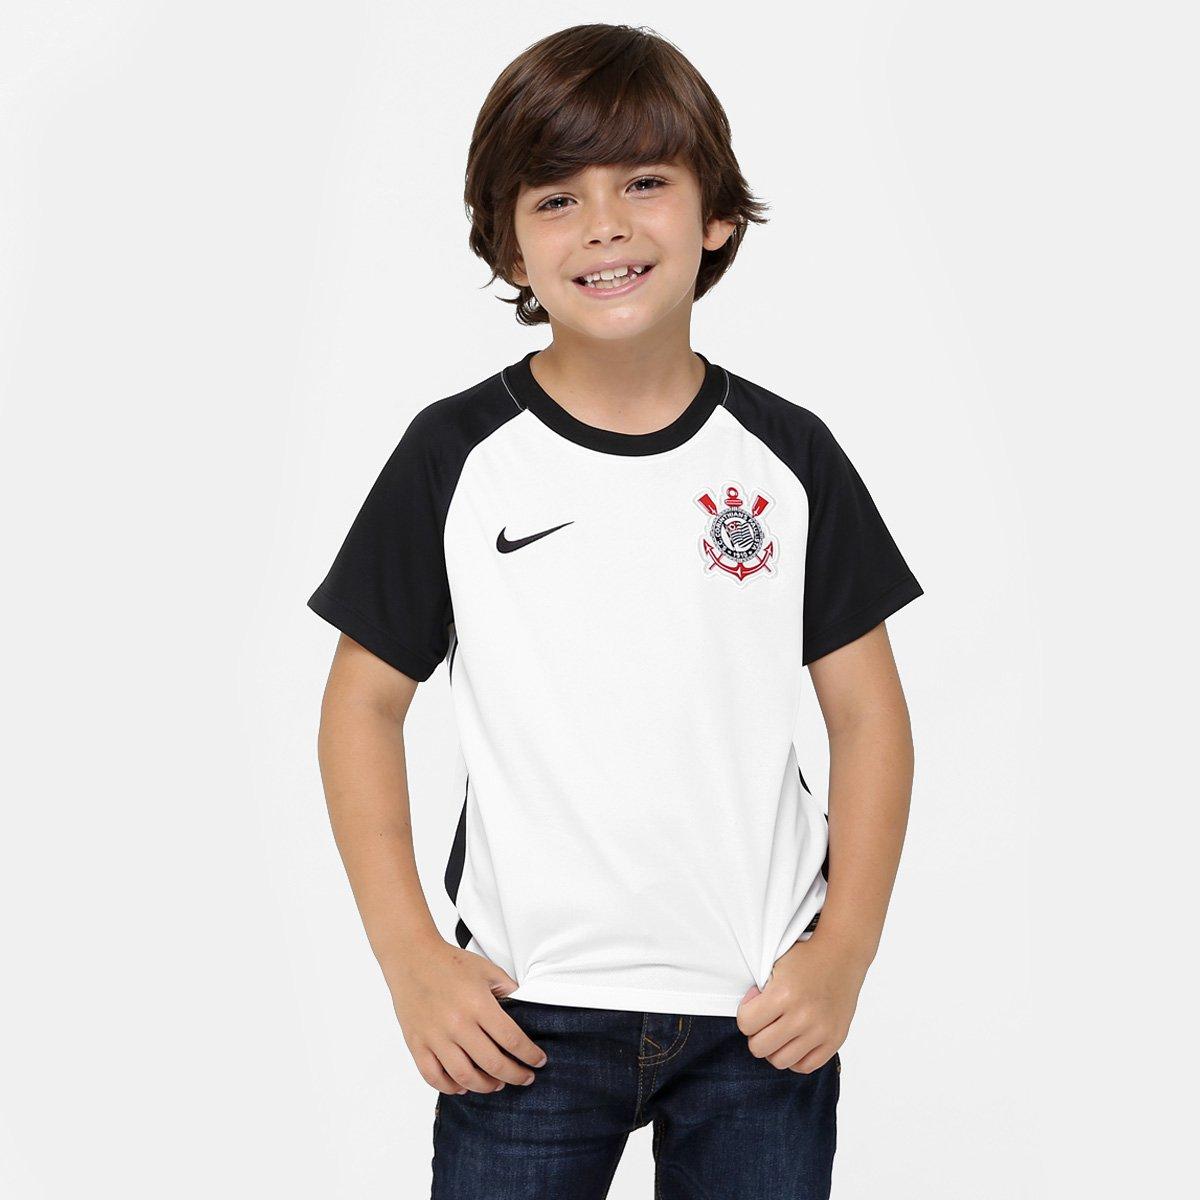 fd58a37785 Camisa Corinthians Infantil I 15 16 s nº - Torcedor Nike - Compre Agora